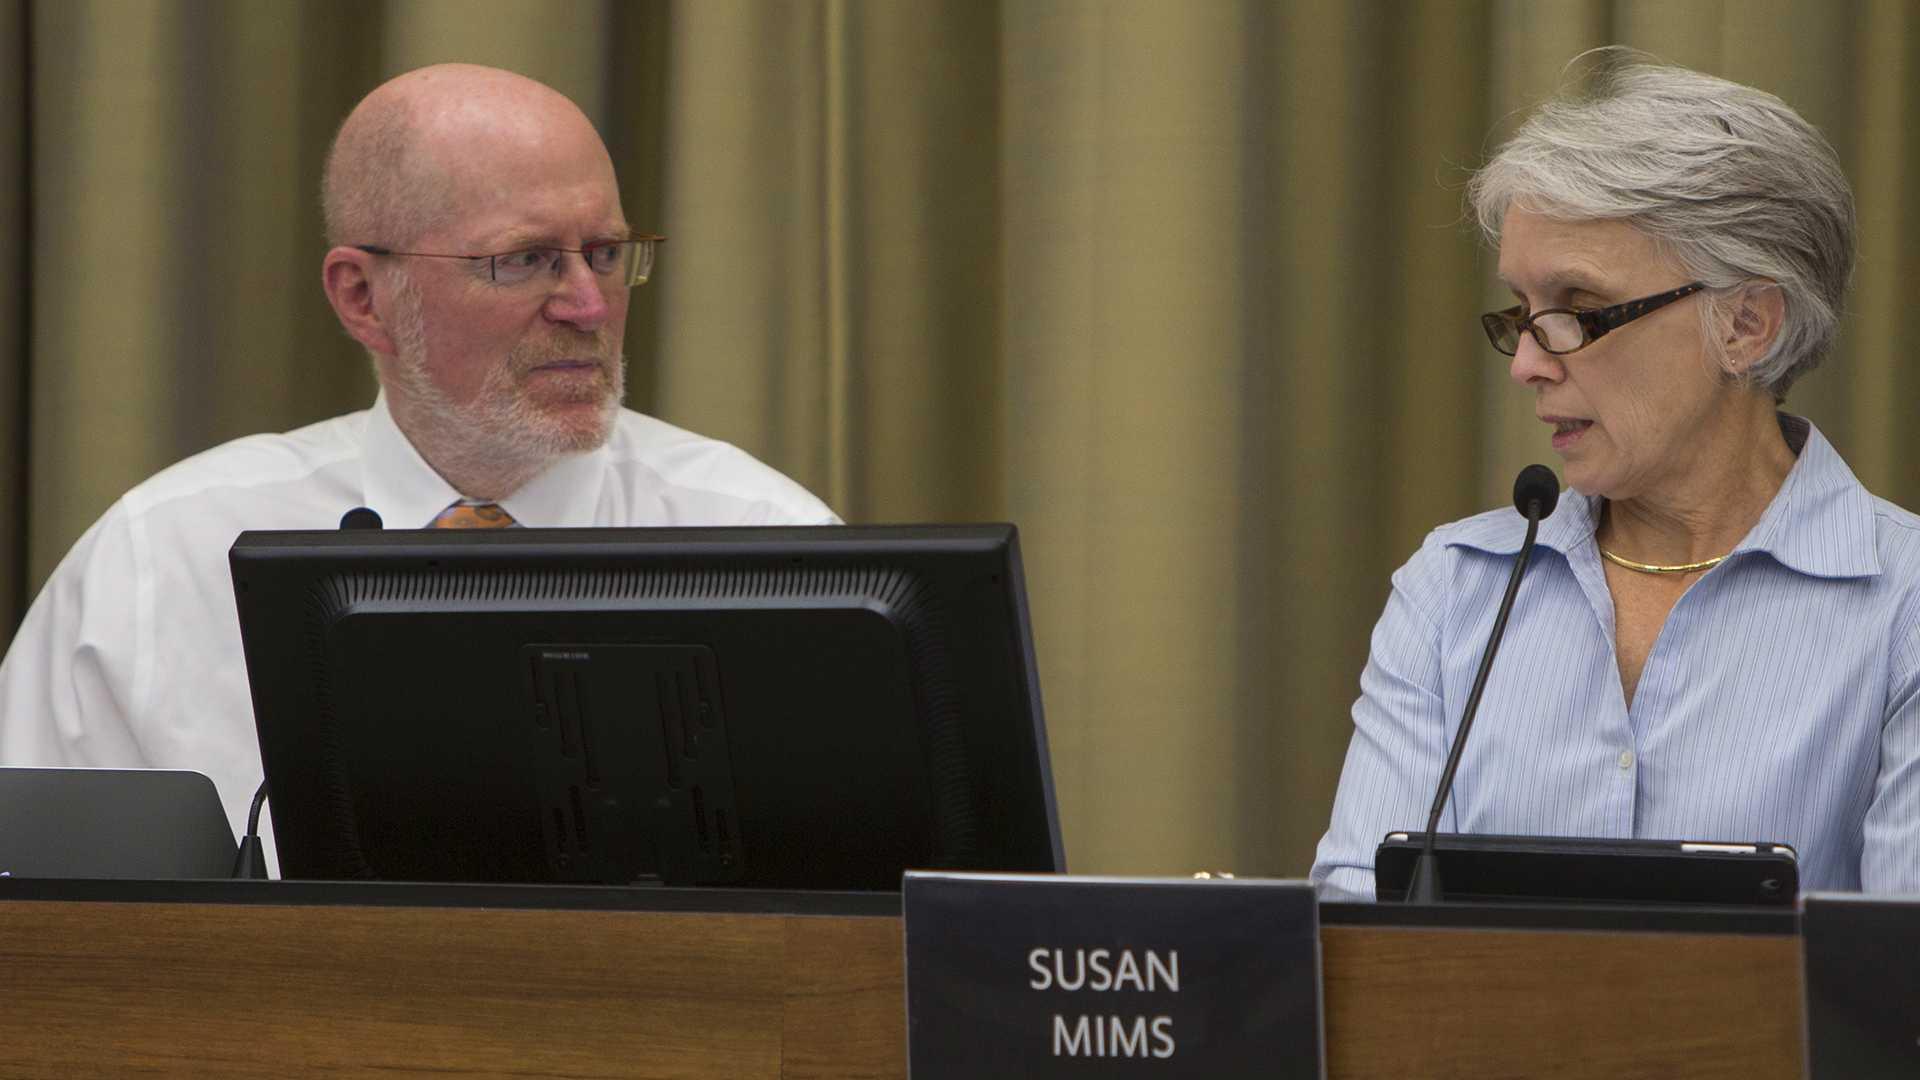 Iowa City mayor Jim Throgmorton and City Councilor Susan Mims speak during an Iowa City Council meeting on Tuesday, Oct. 18, 2016. (The Daily Iowan/Olivia Sun)